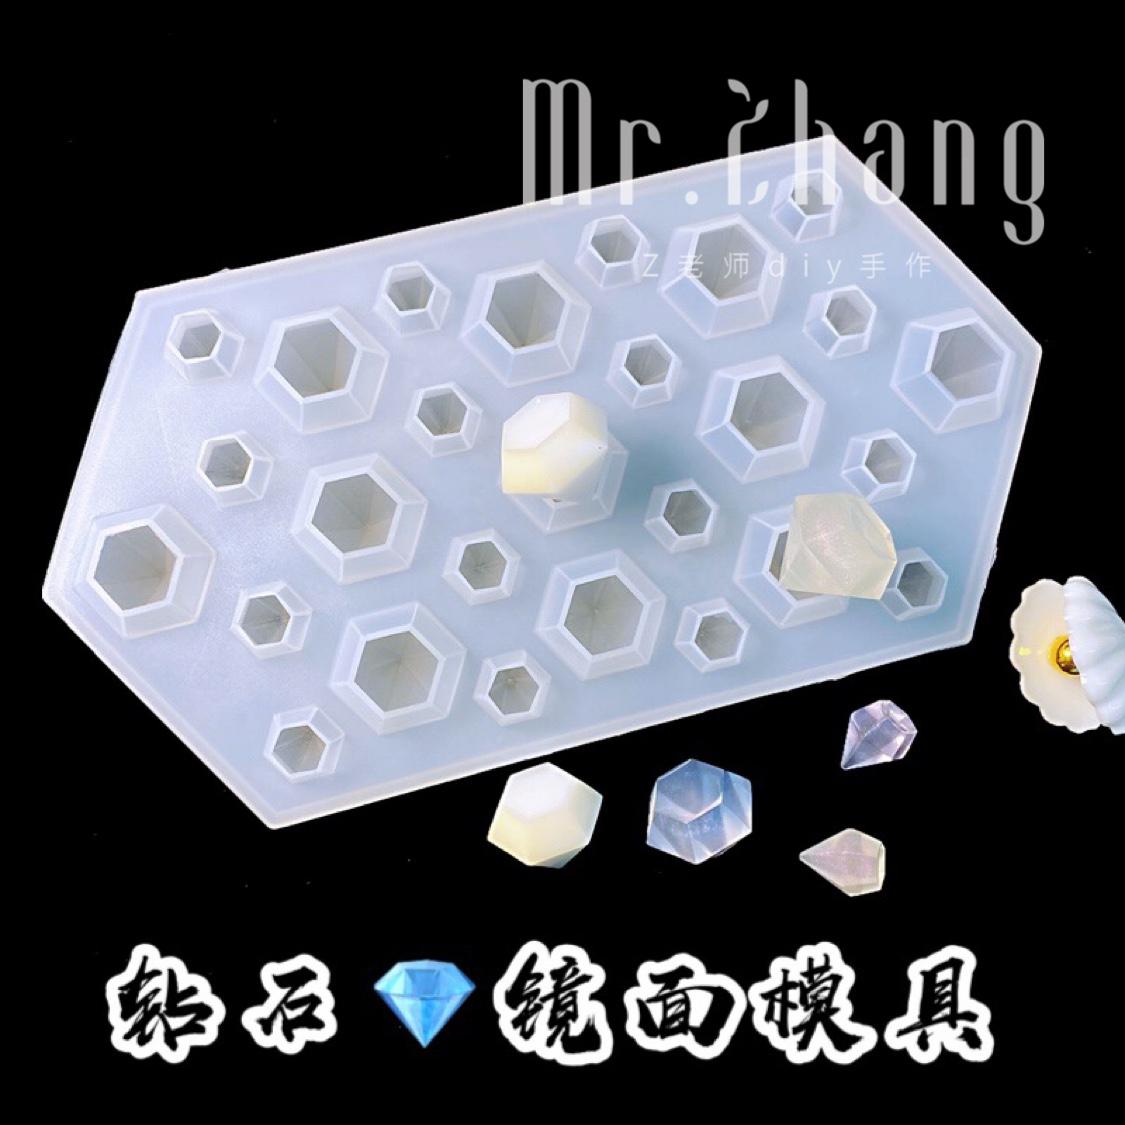 Z老师diy 钻石模具 滴胶模具 多规格镜面高透硅胶饰品配件模具